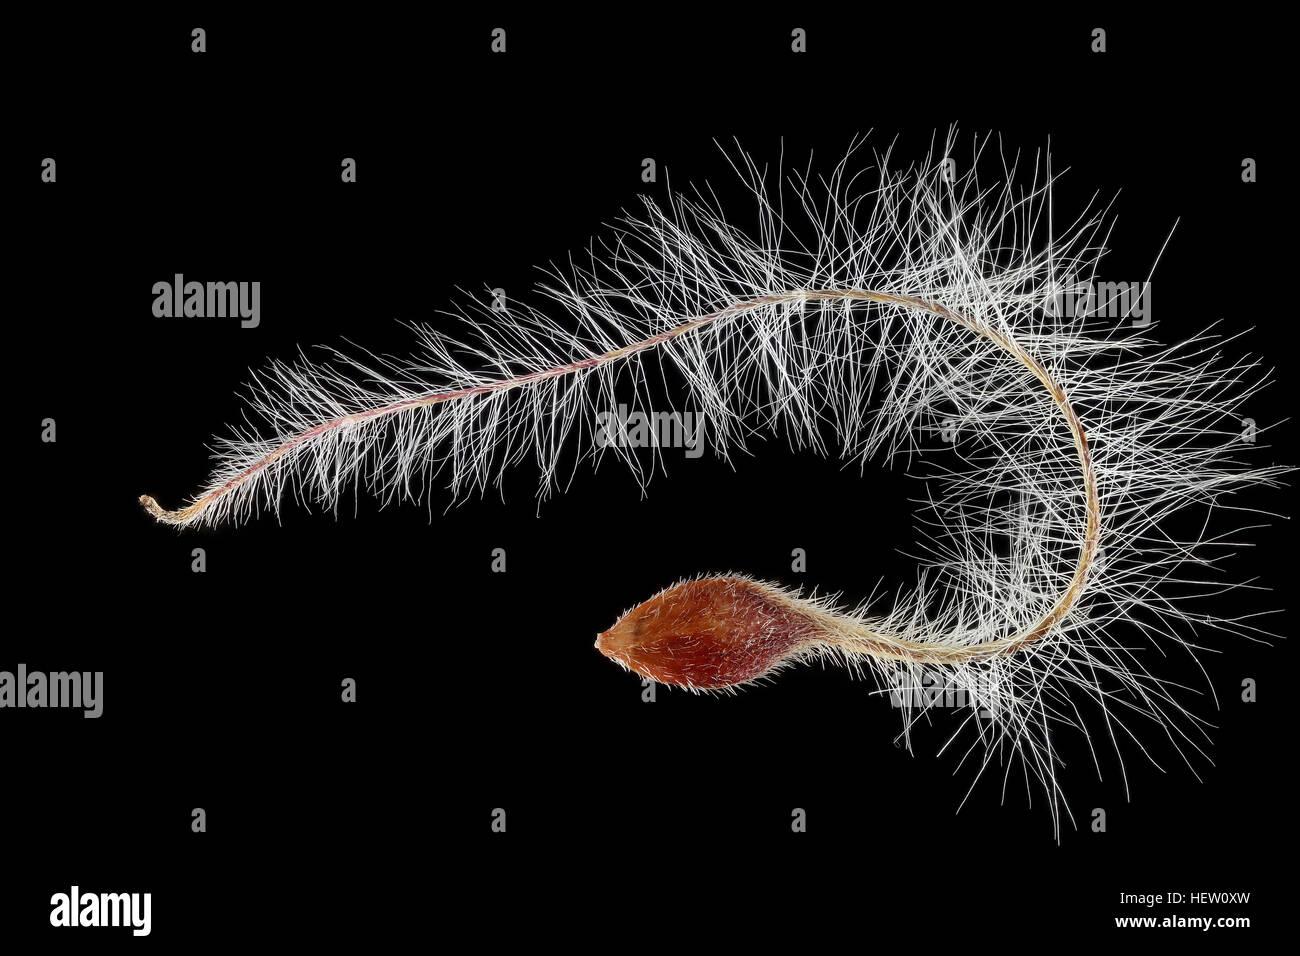 Clematis vitalba, Old man's beard, Gemeine Waldrebe, seed, close up, seed size 3-4 mm - Stock Image